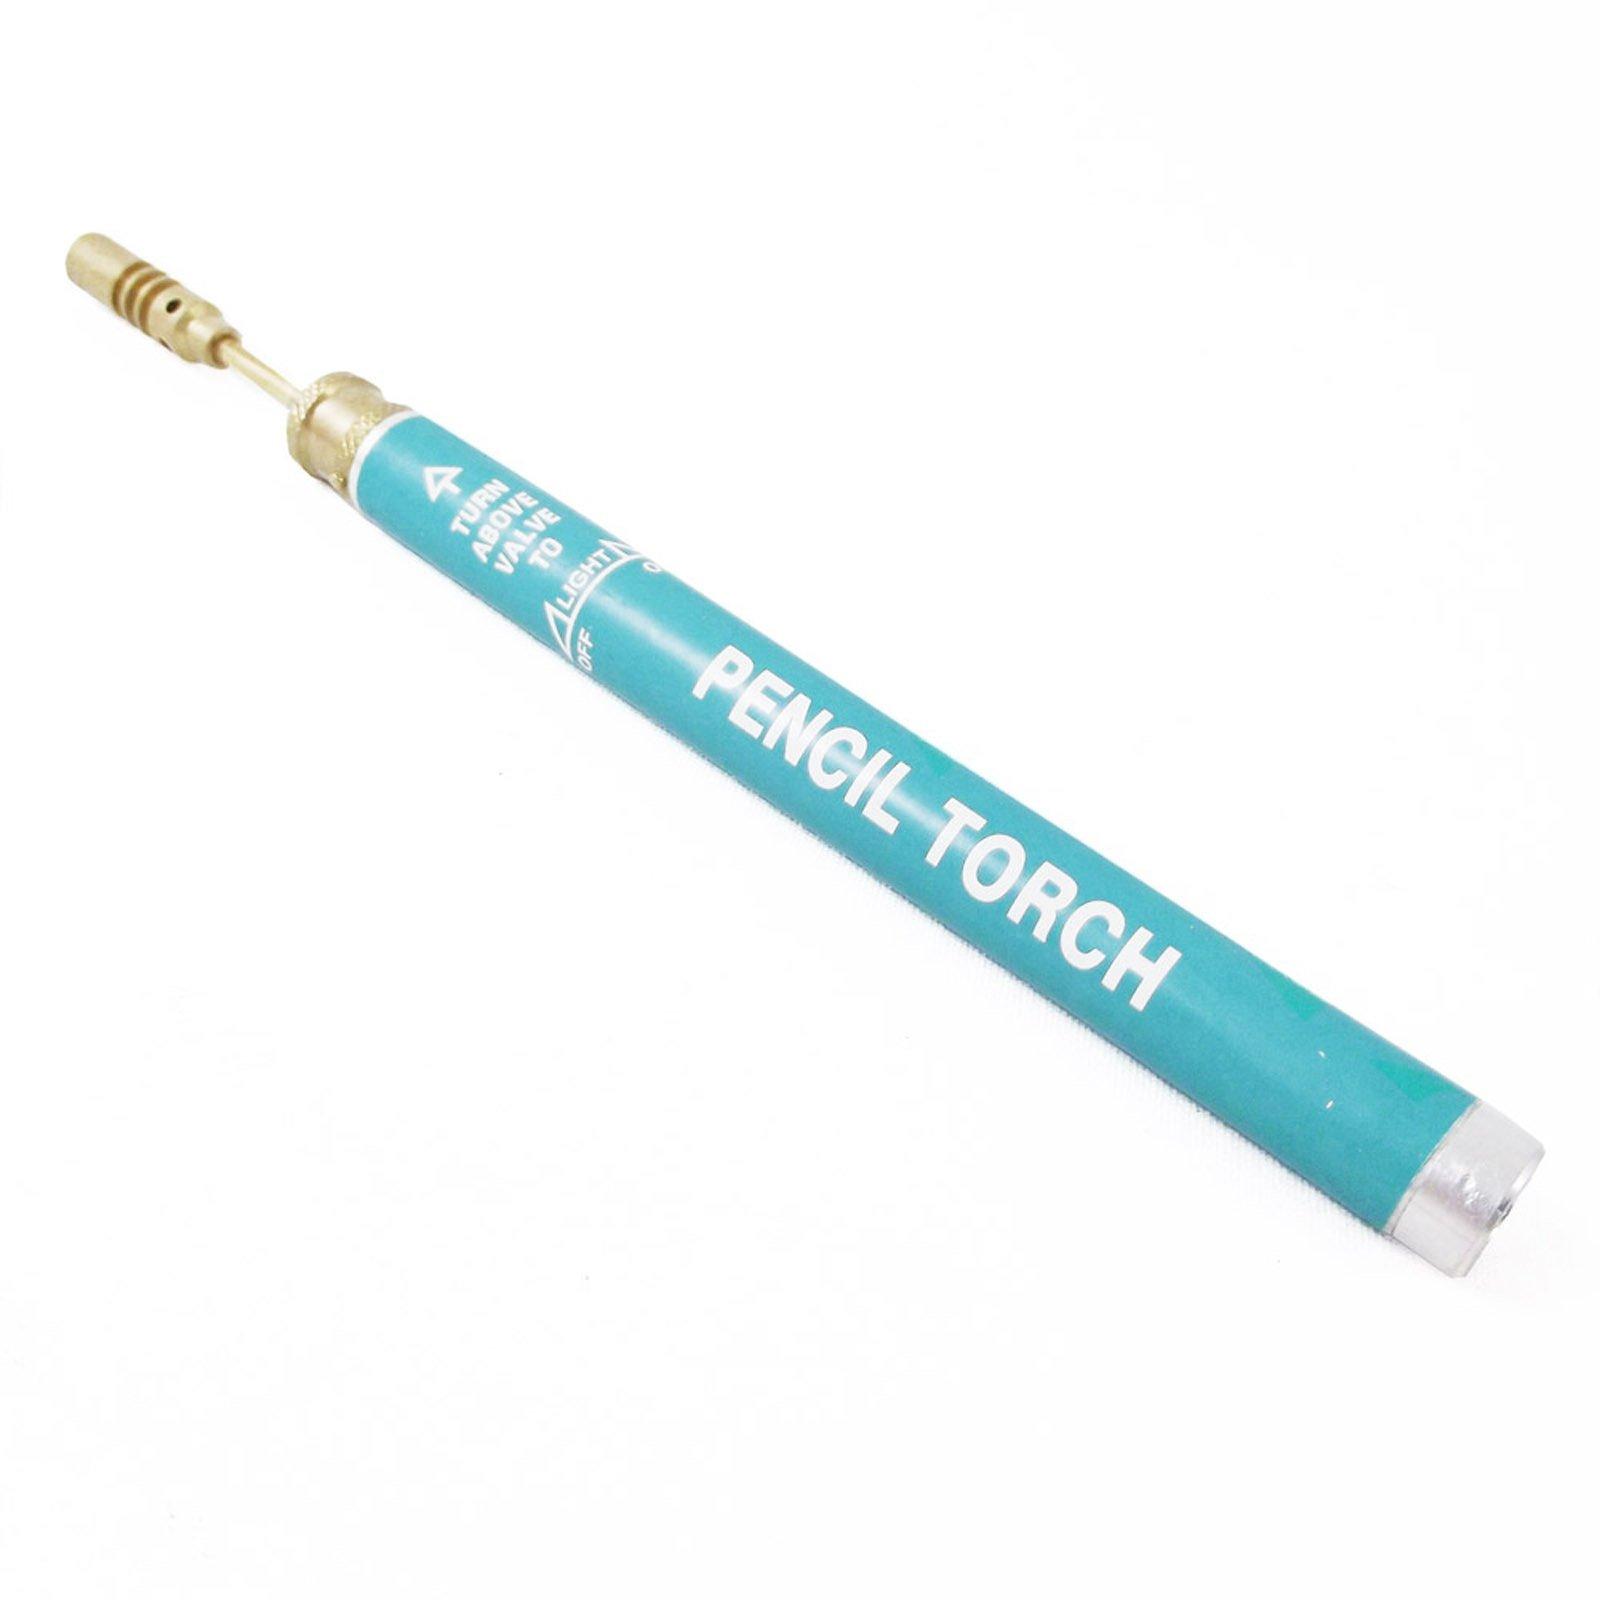 Metalworking Butane Pencil Torch